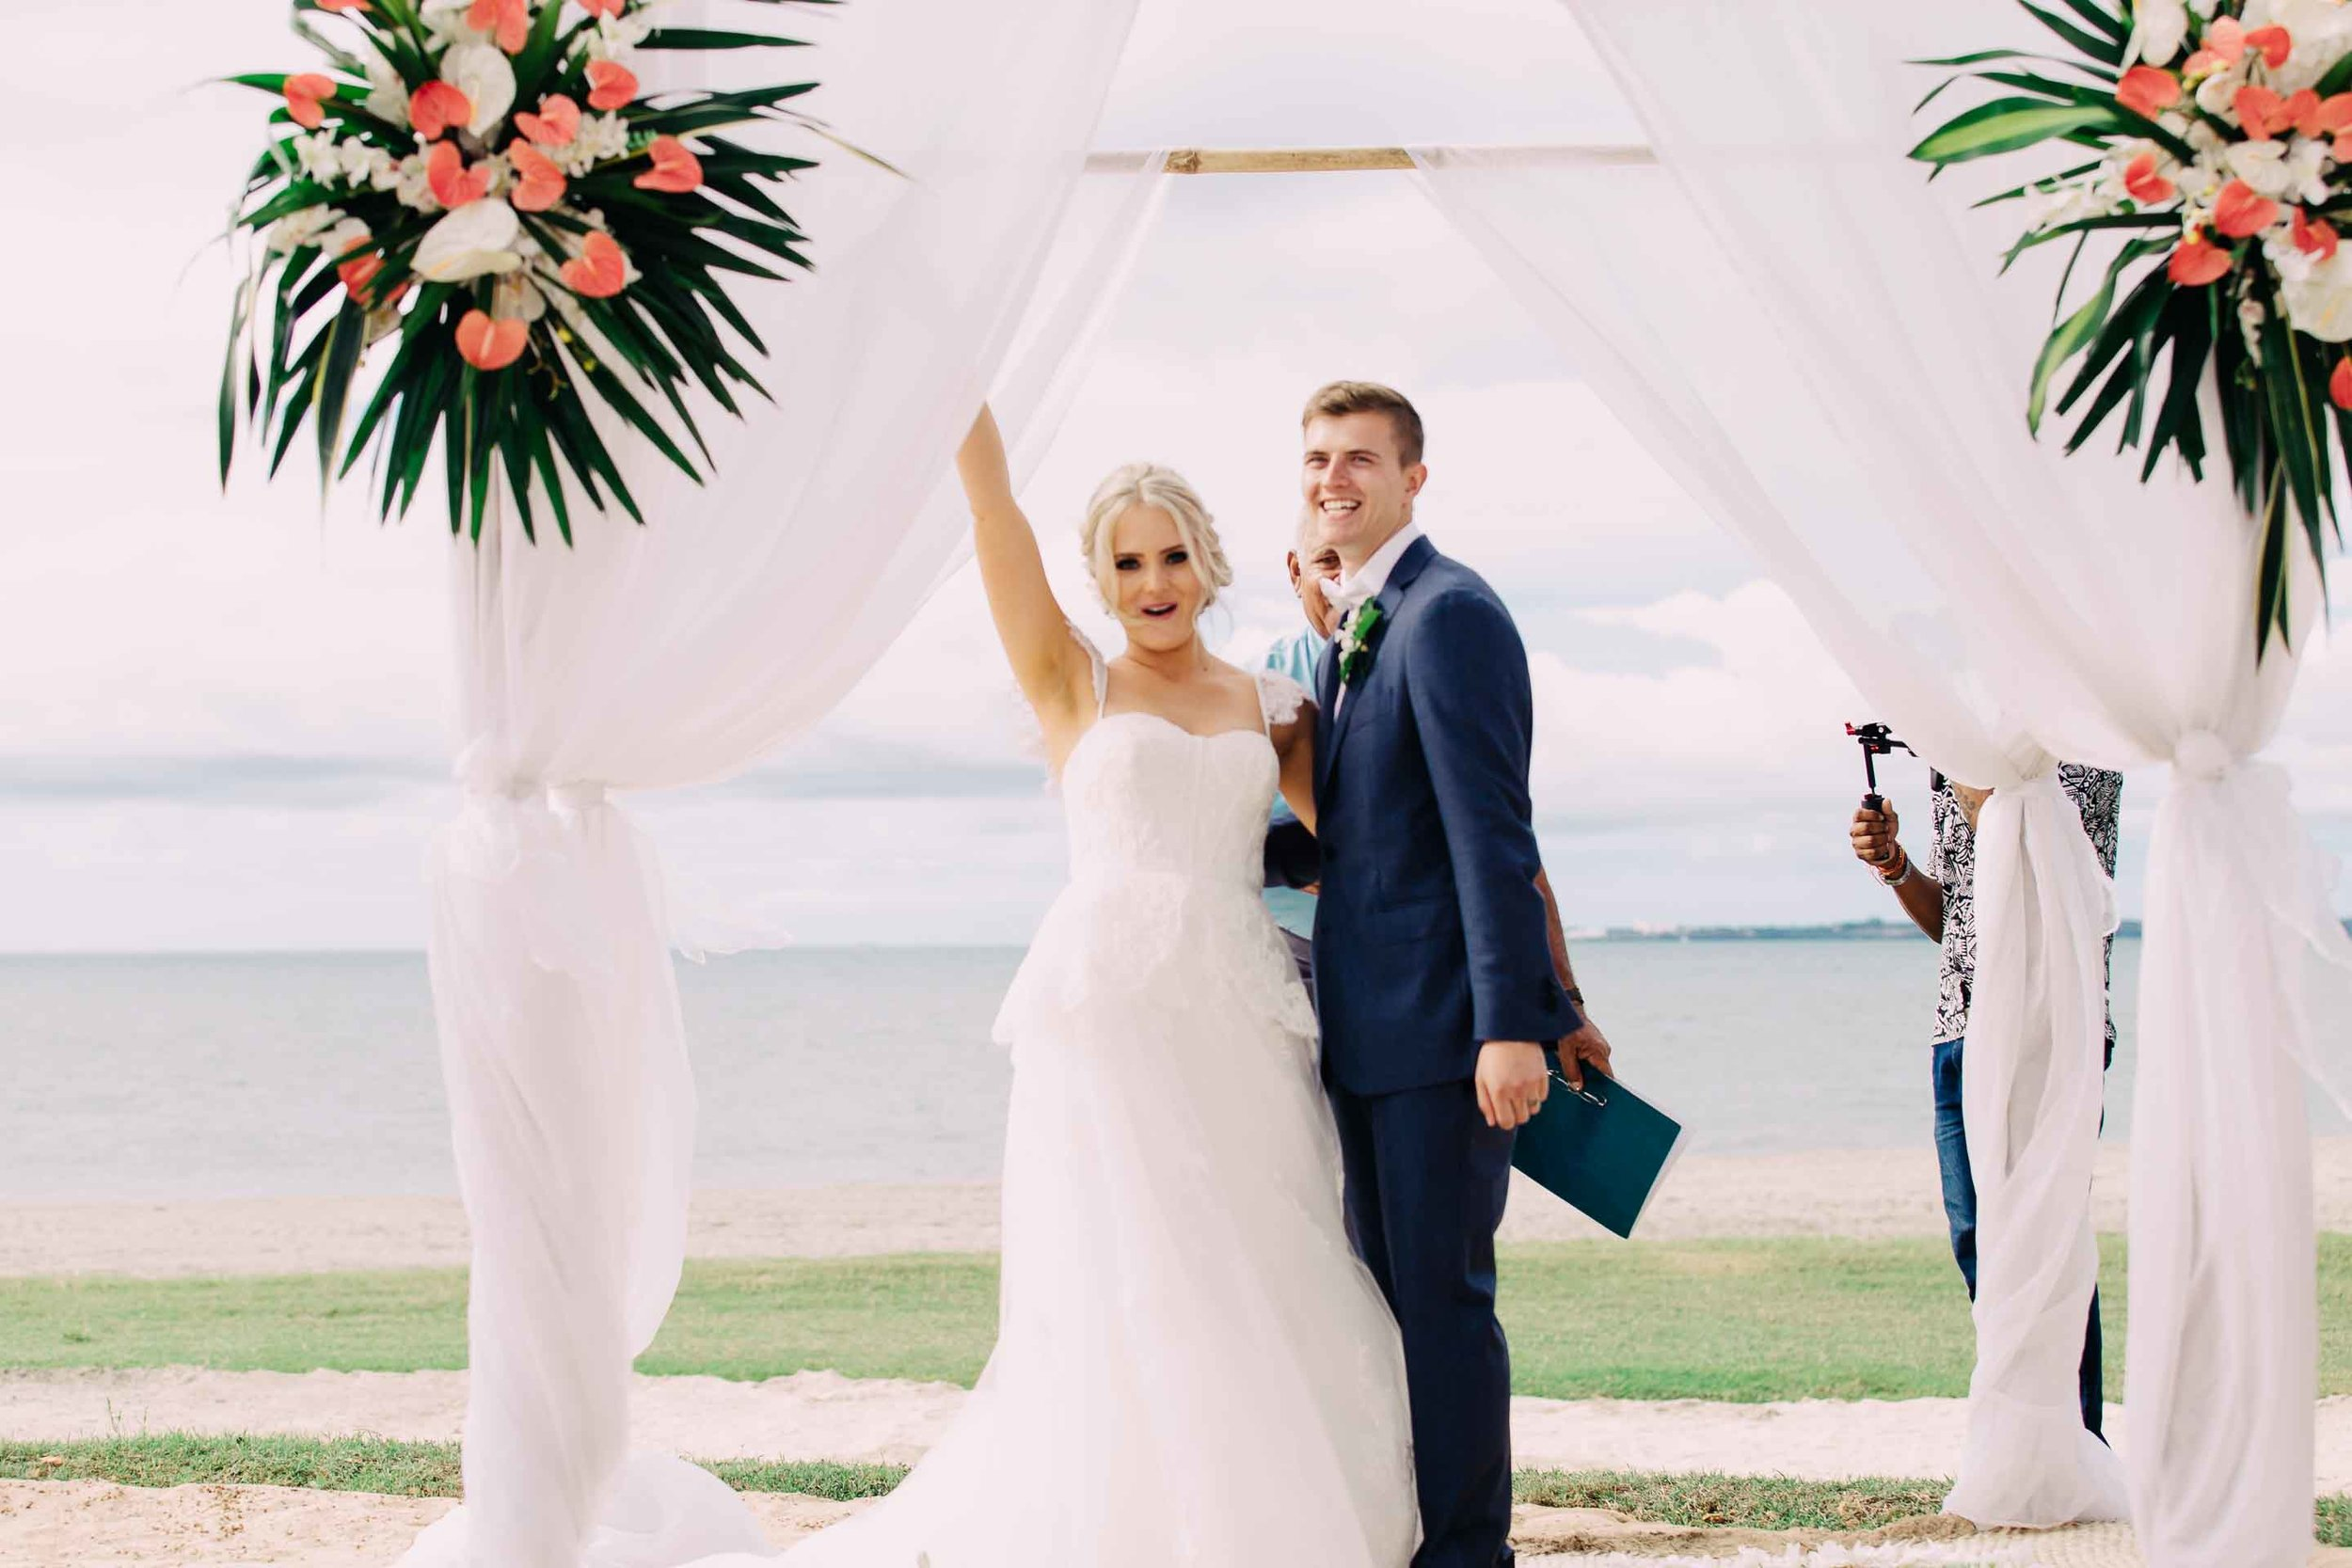 Newlyweds. Just pronounced husband and wife.